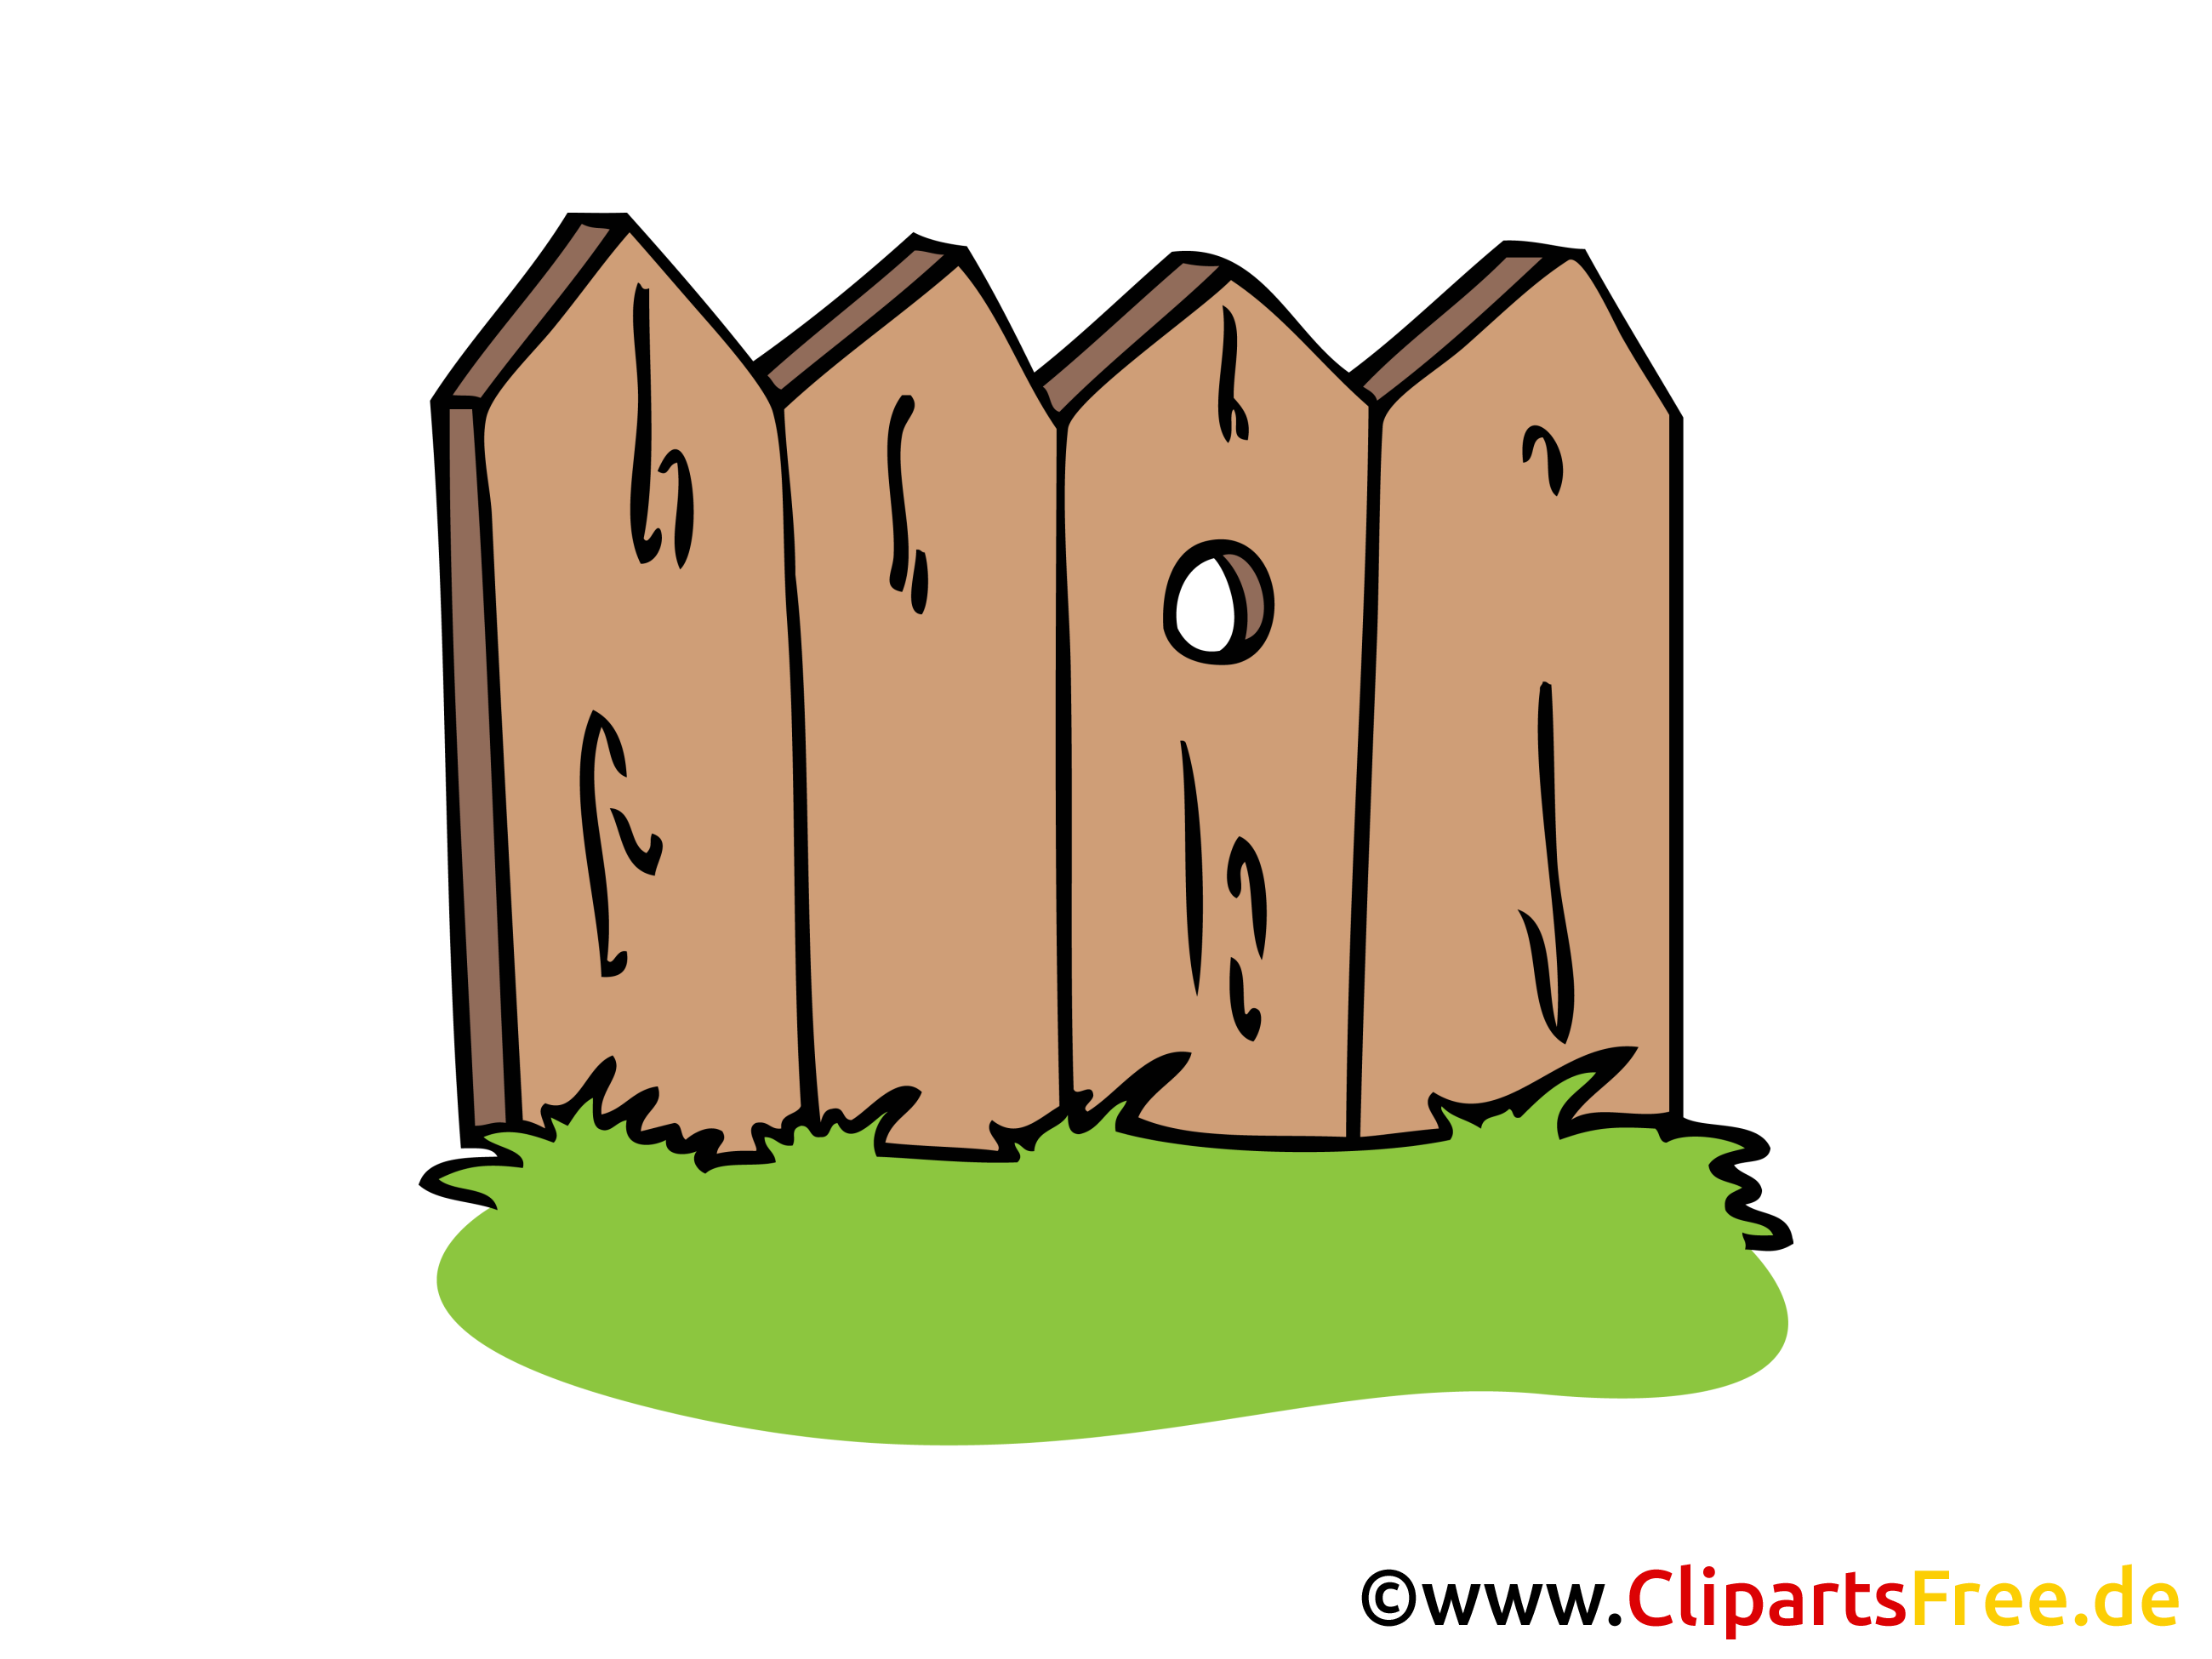 Zaun Aus Holz Bild Clipart Illustration Grafik Gratis